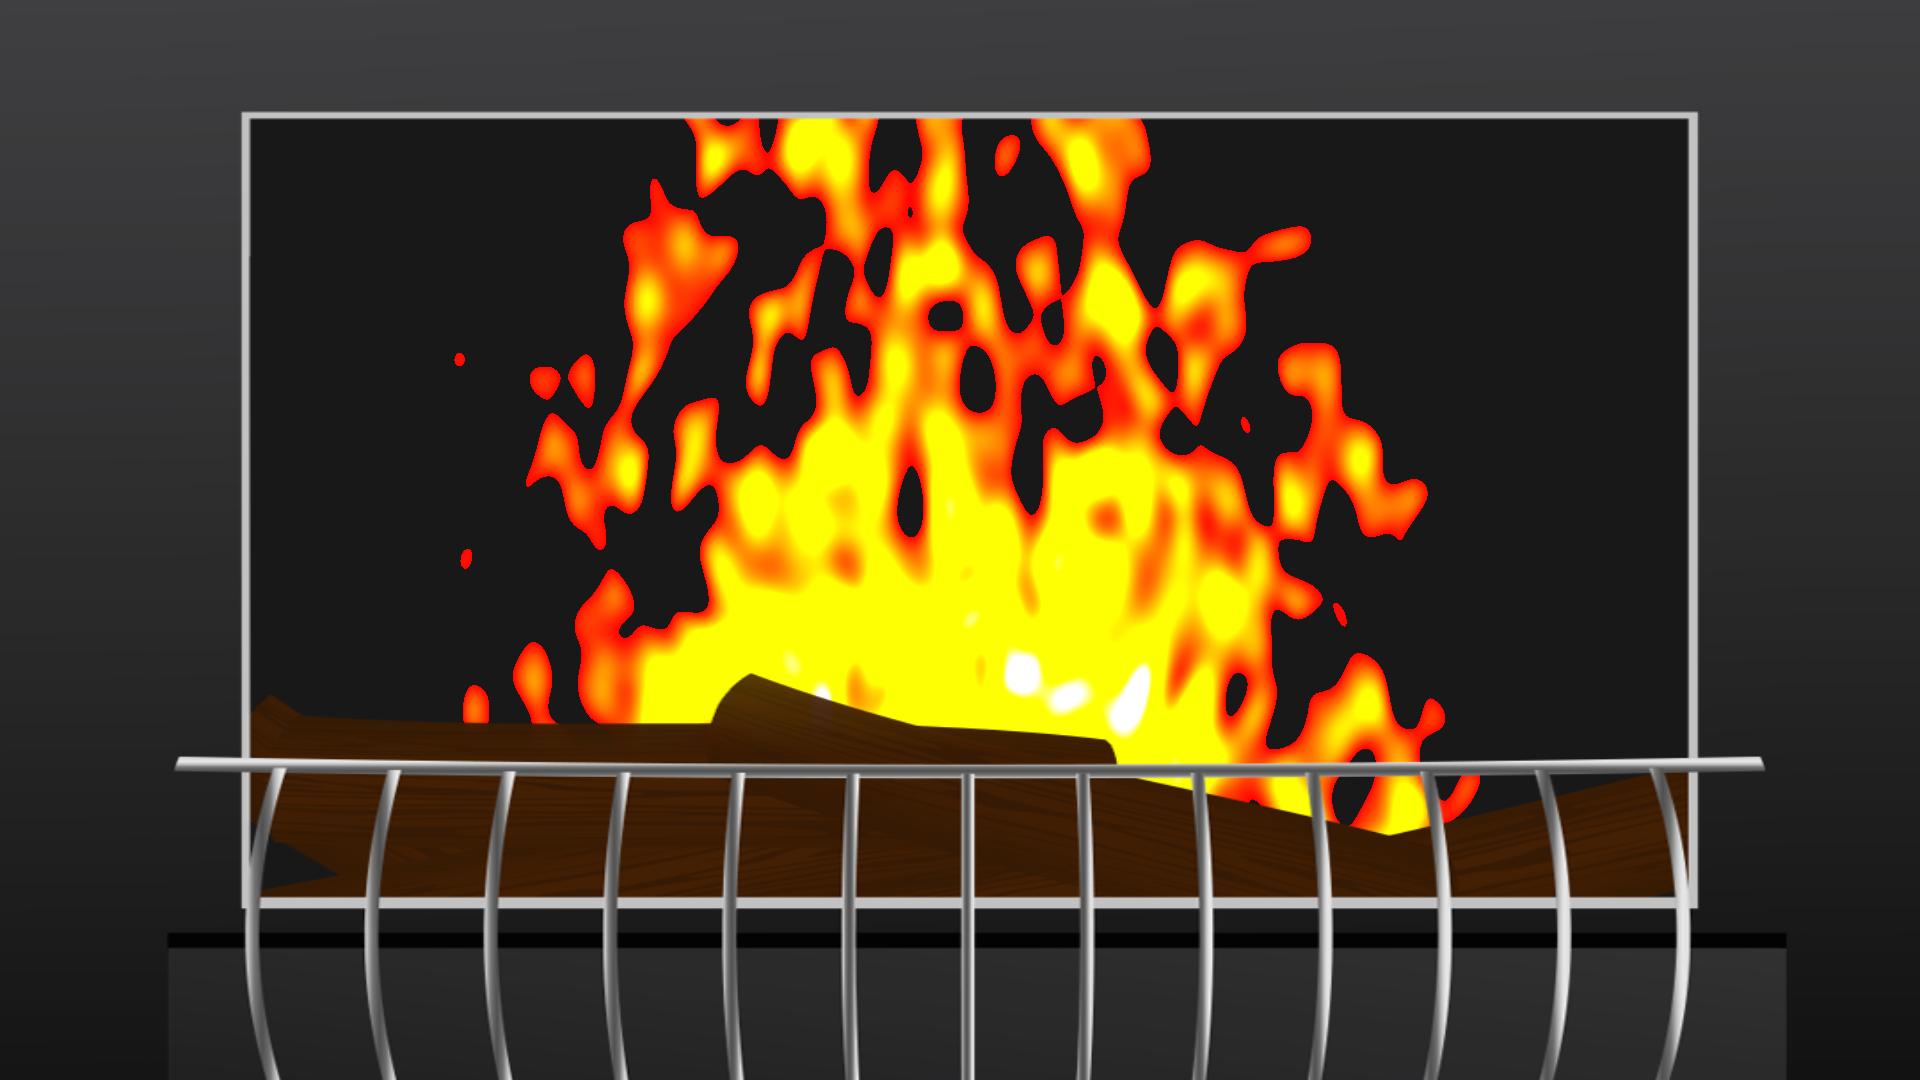 Sensory Flames - Free Fireplace for your TV screenshot 4